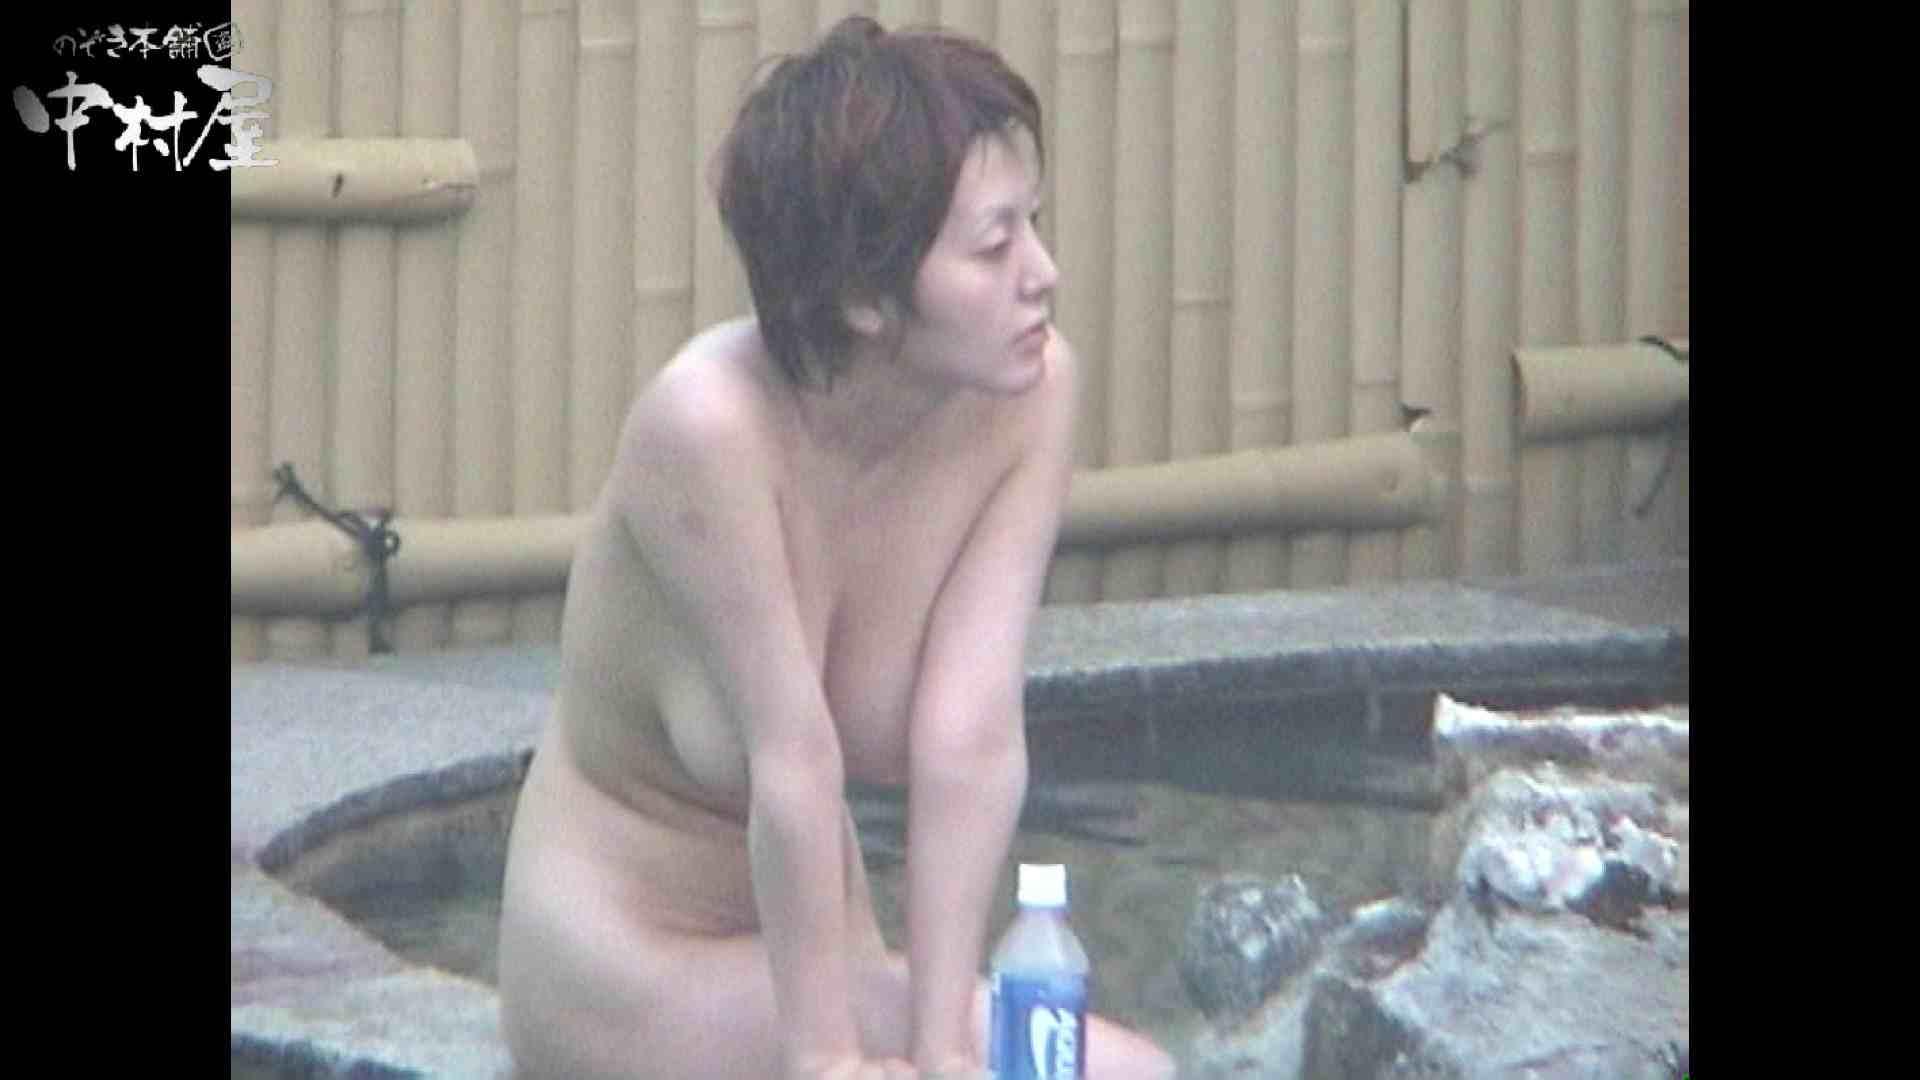 Aquaな露天風呂Vol.959 盗撮シリーズ | 露天風呂編  80PIX 57